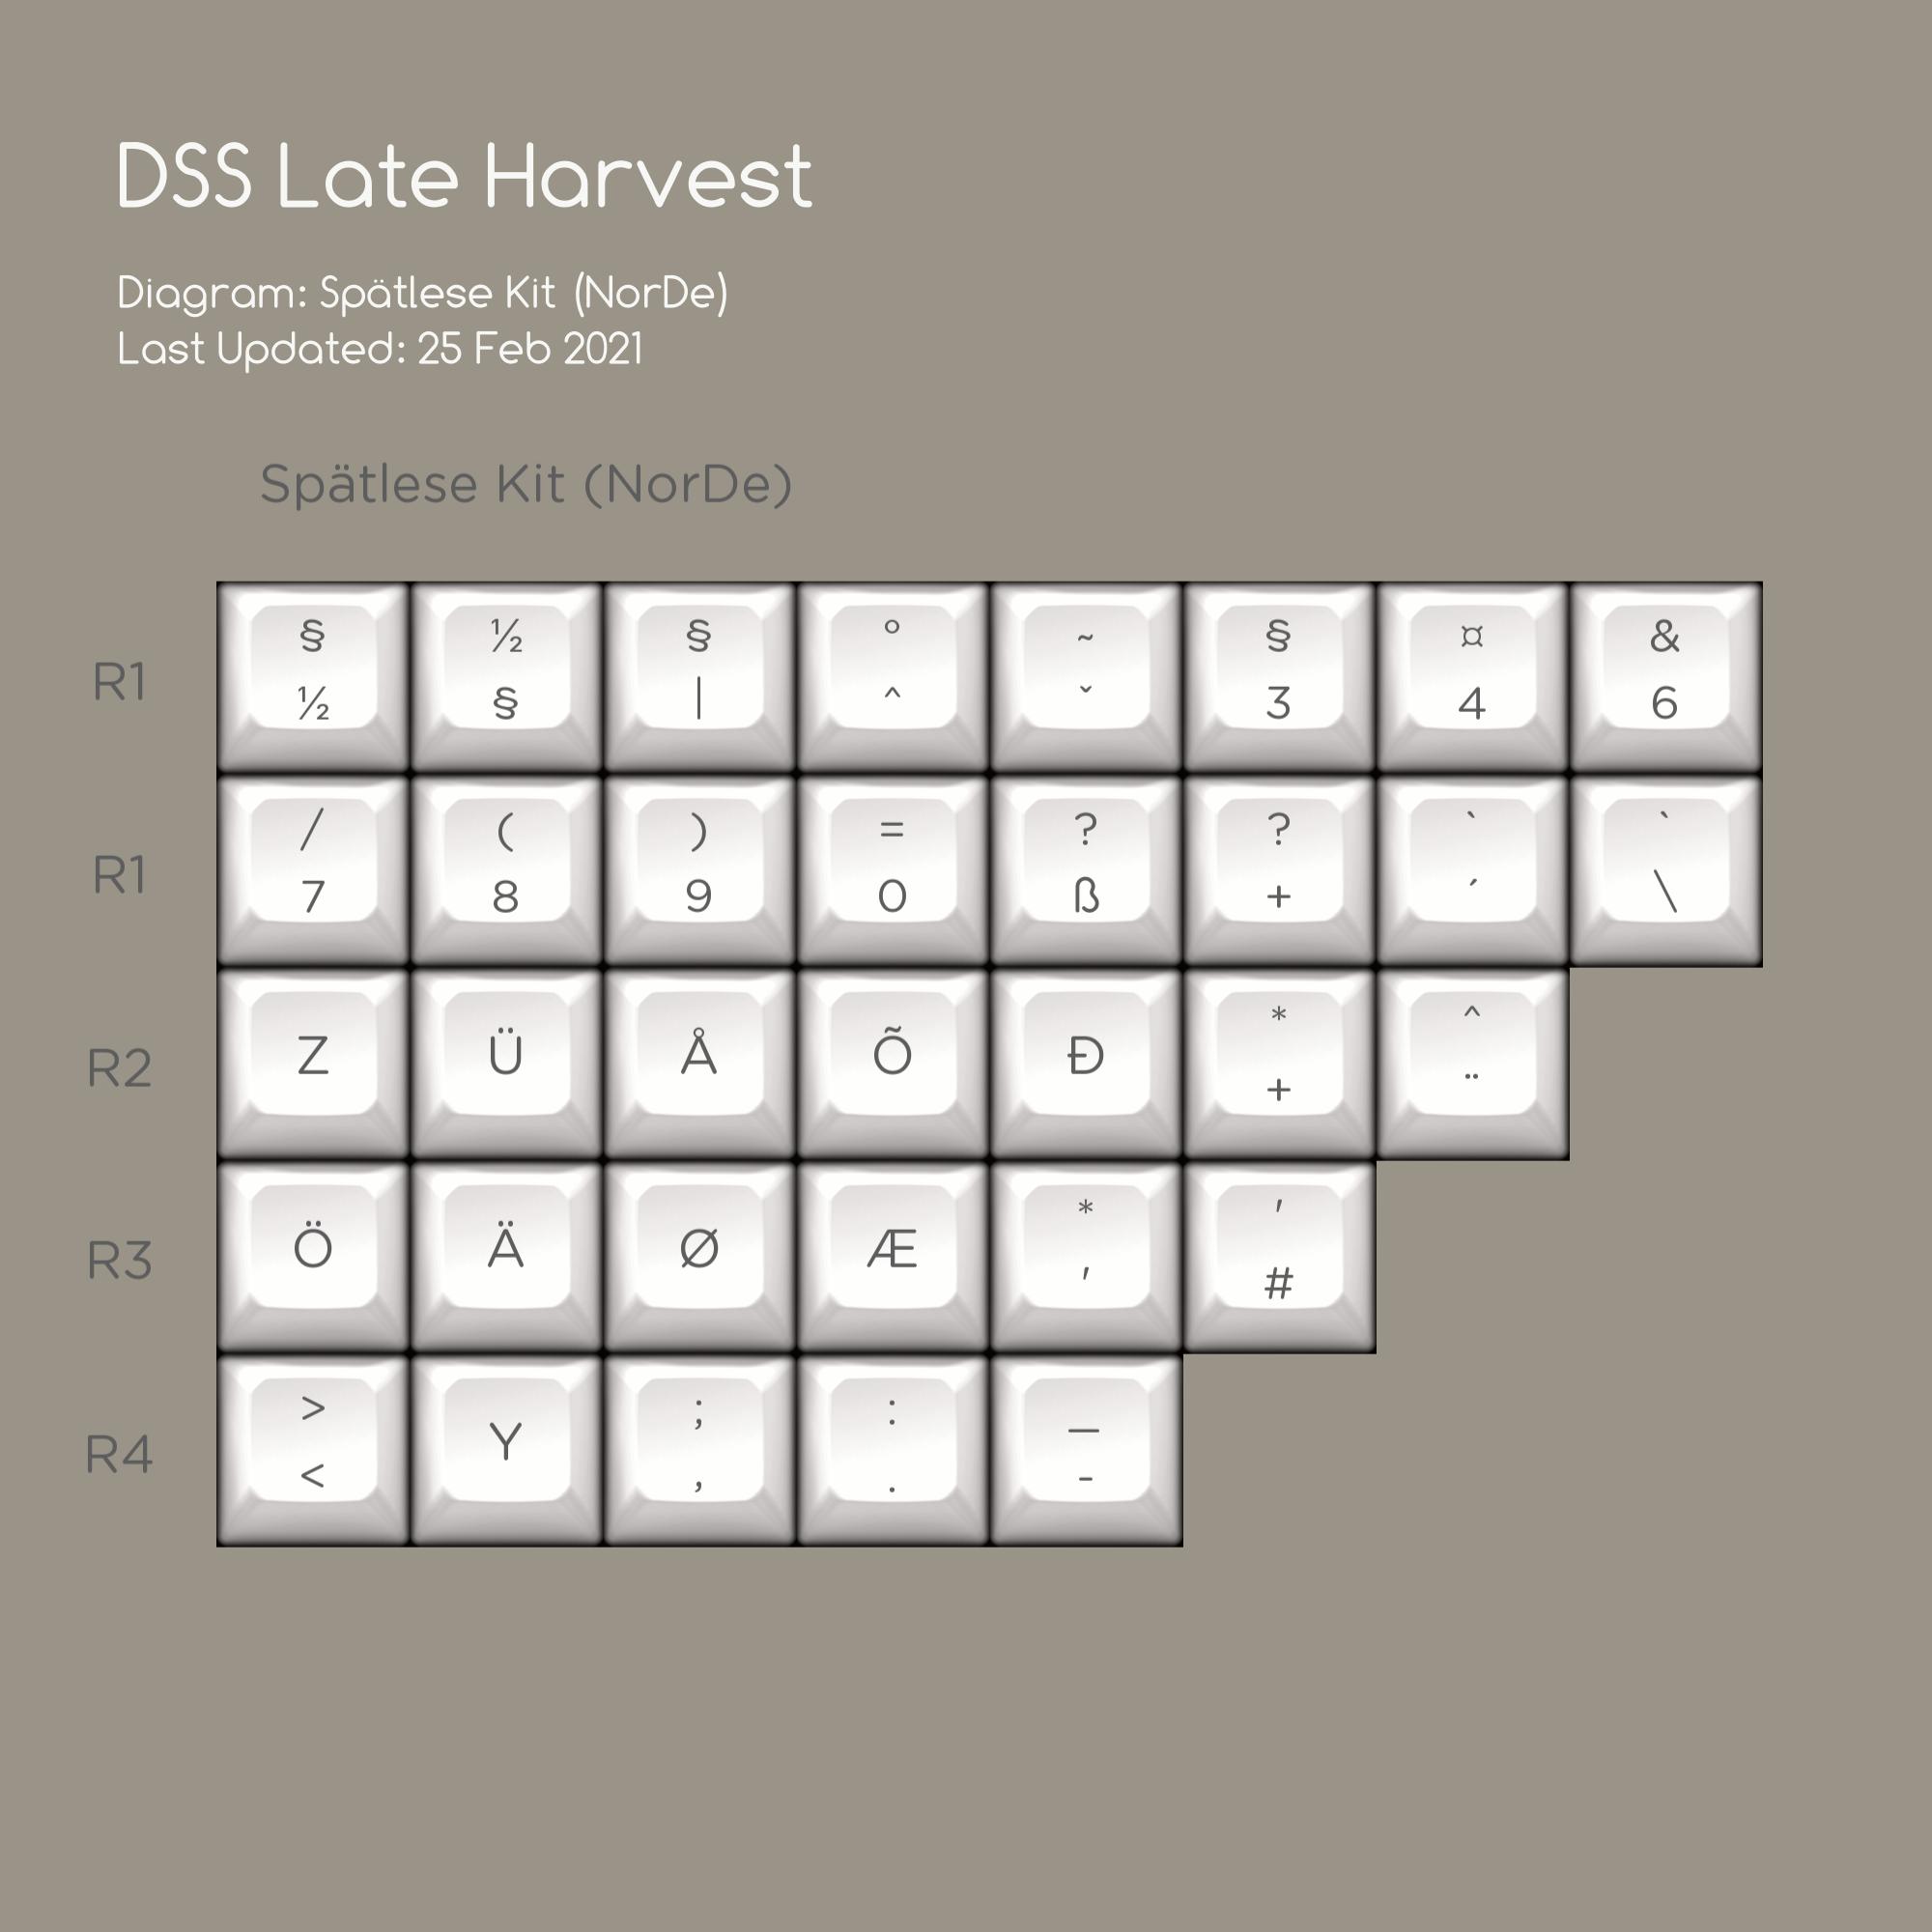 DSS Late Harvest Spätlese Kit (NorDe) Diagram